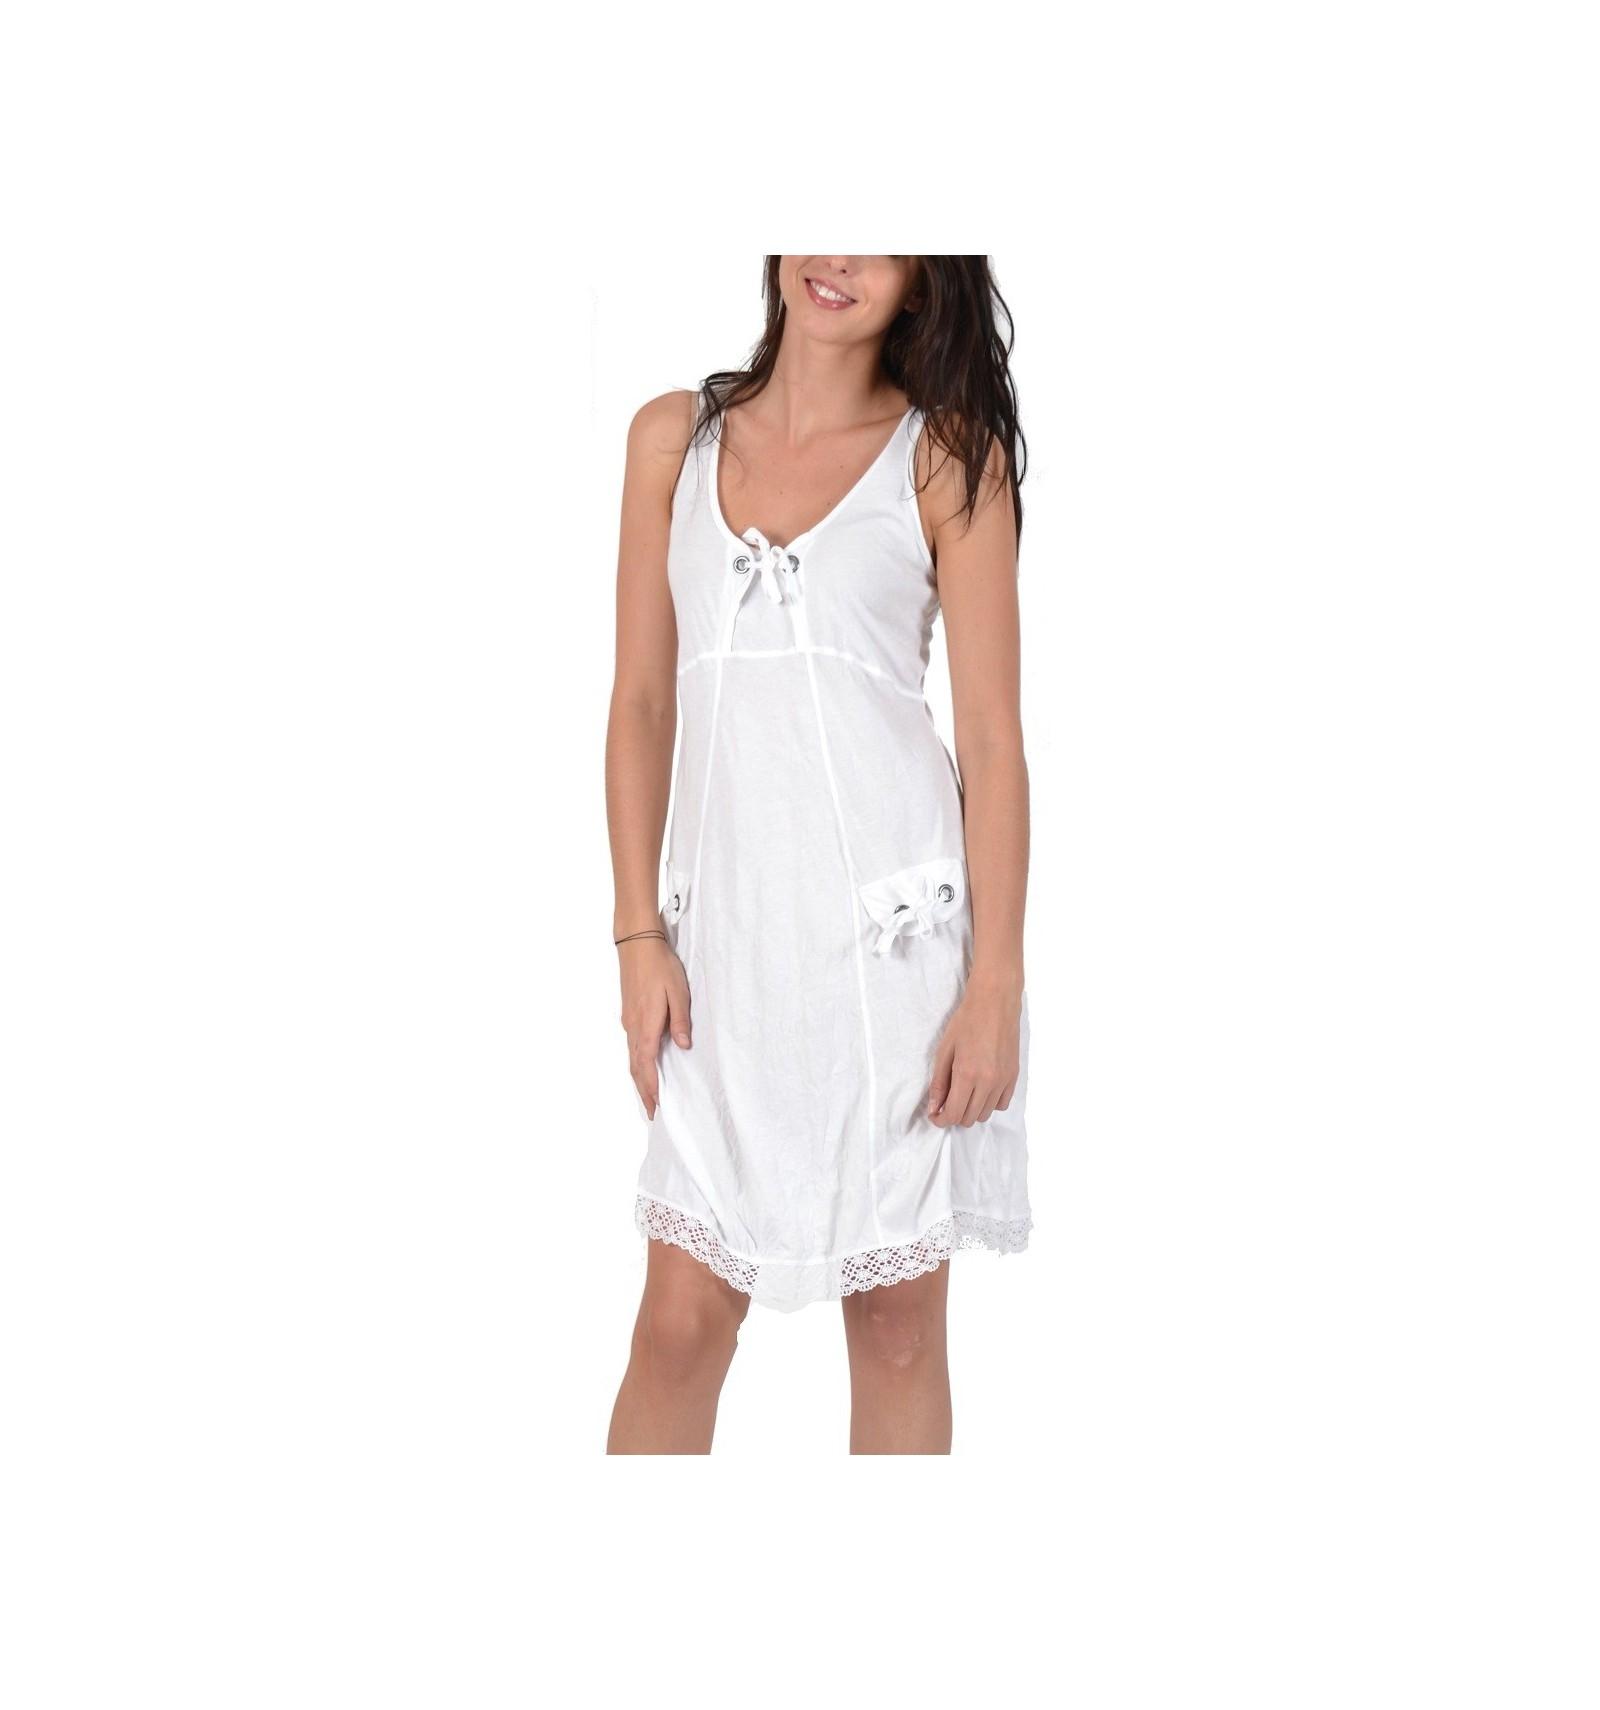 robe courte en coton maloka couleur blanche mode. Black Bedroom Furniture Sets. Home Design Ideas